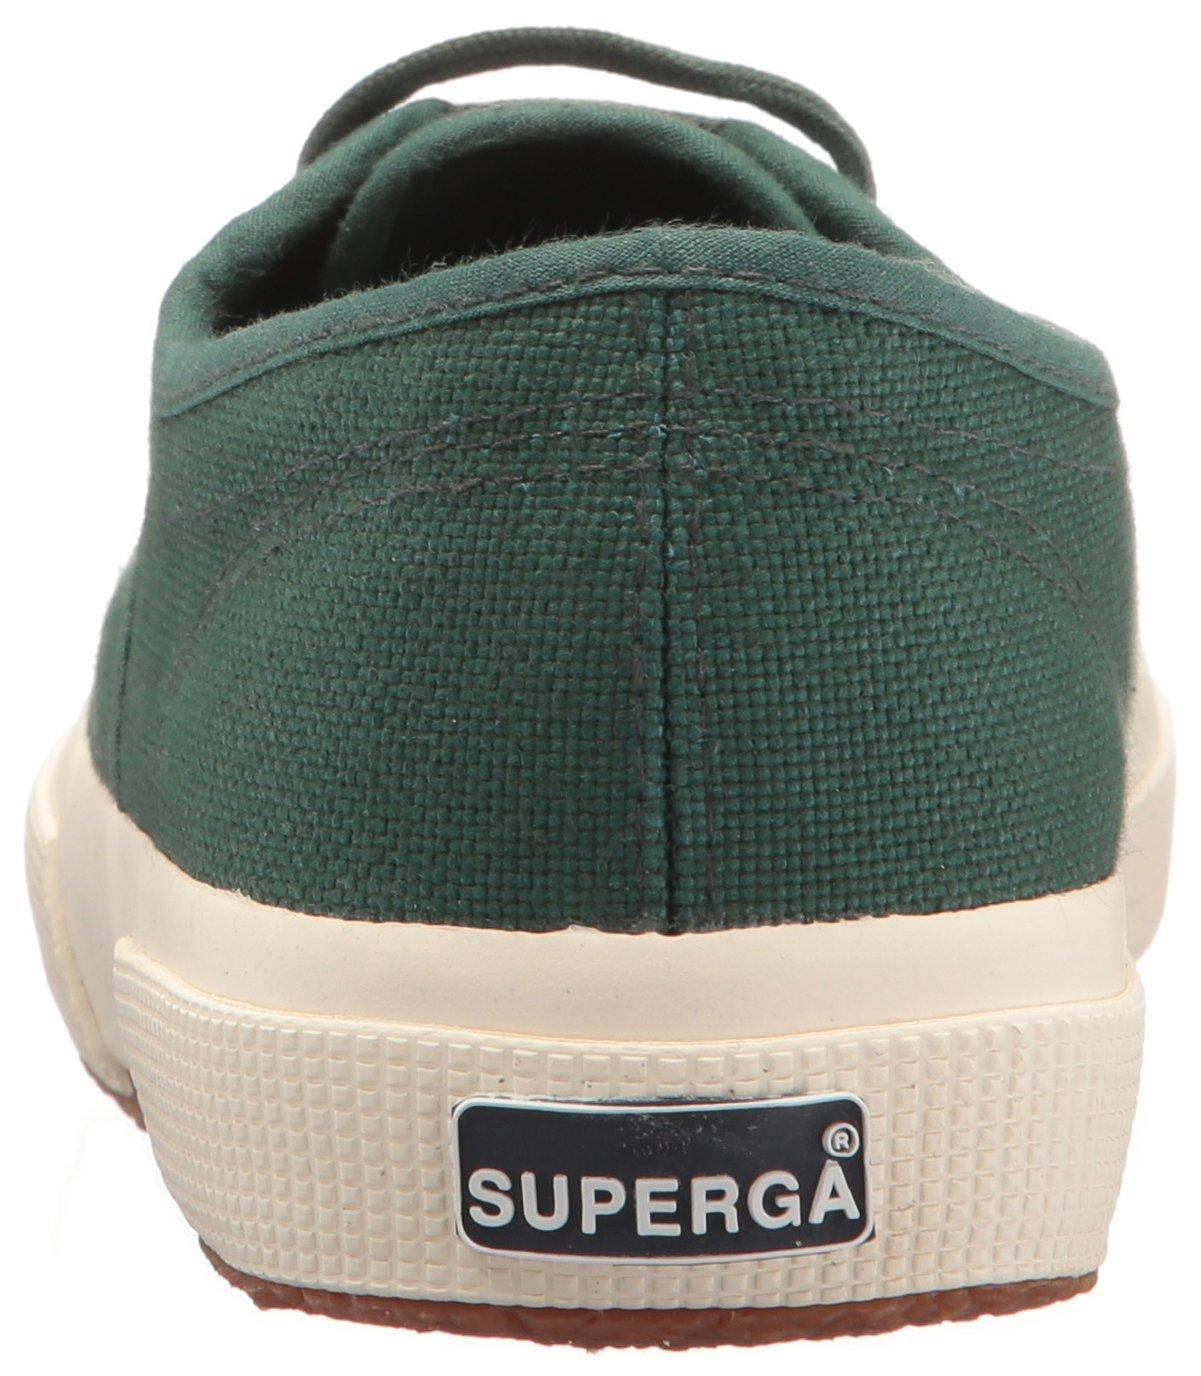 Superga Women's 2750 Cotu Sneaker B073ZK6XWK 38 M EU|Forest Green 310